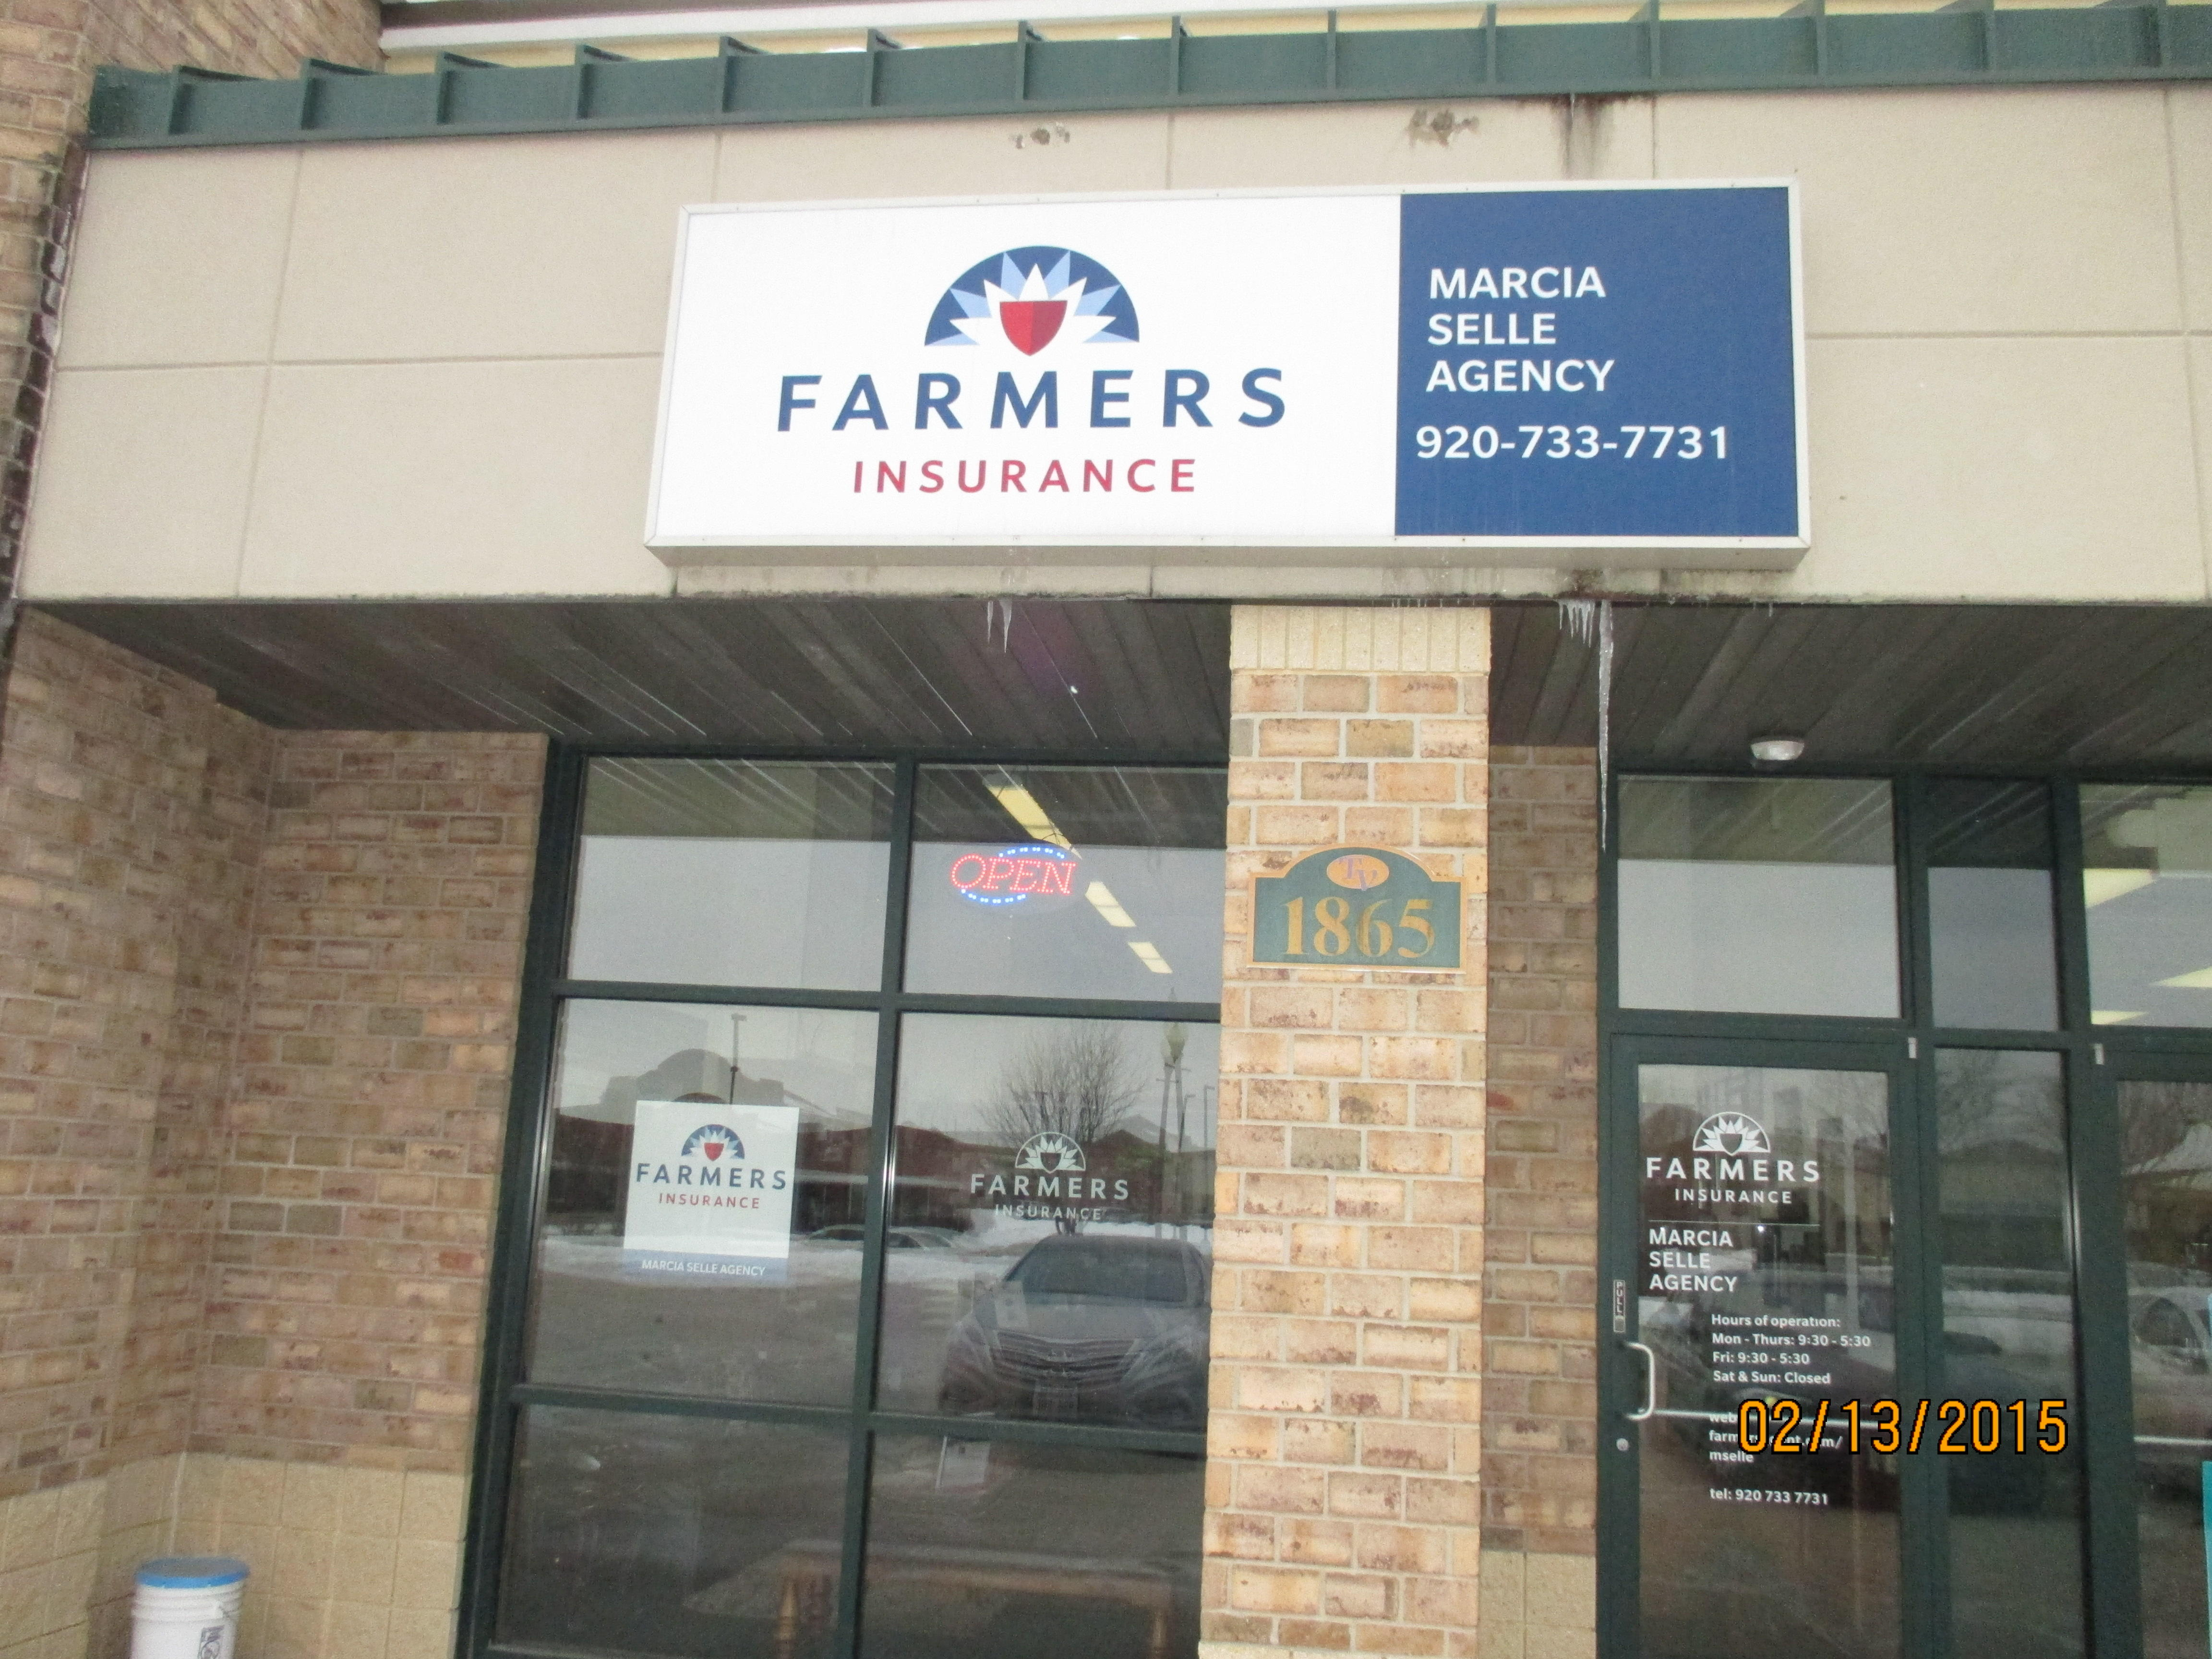 Farmers Insurance - Marcia Selle image 4